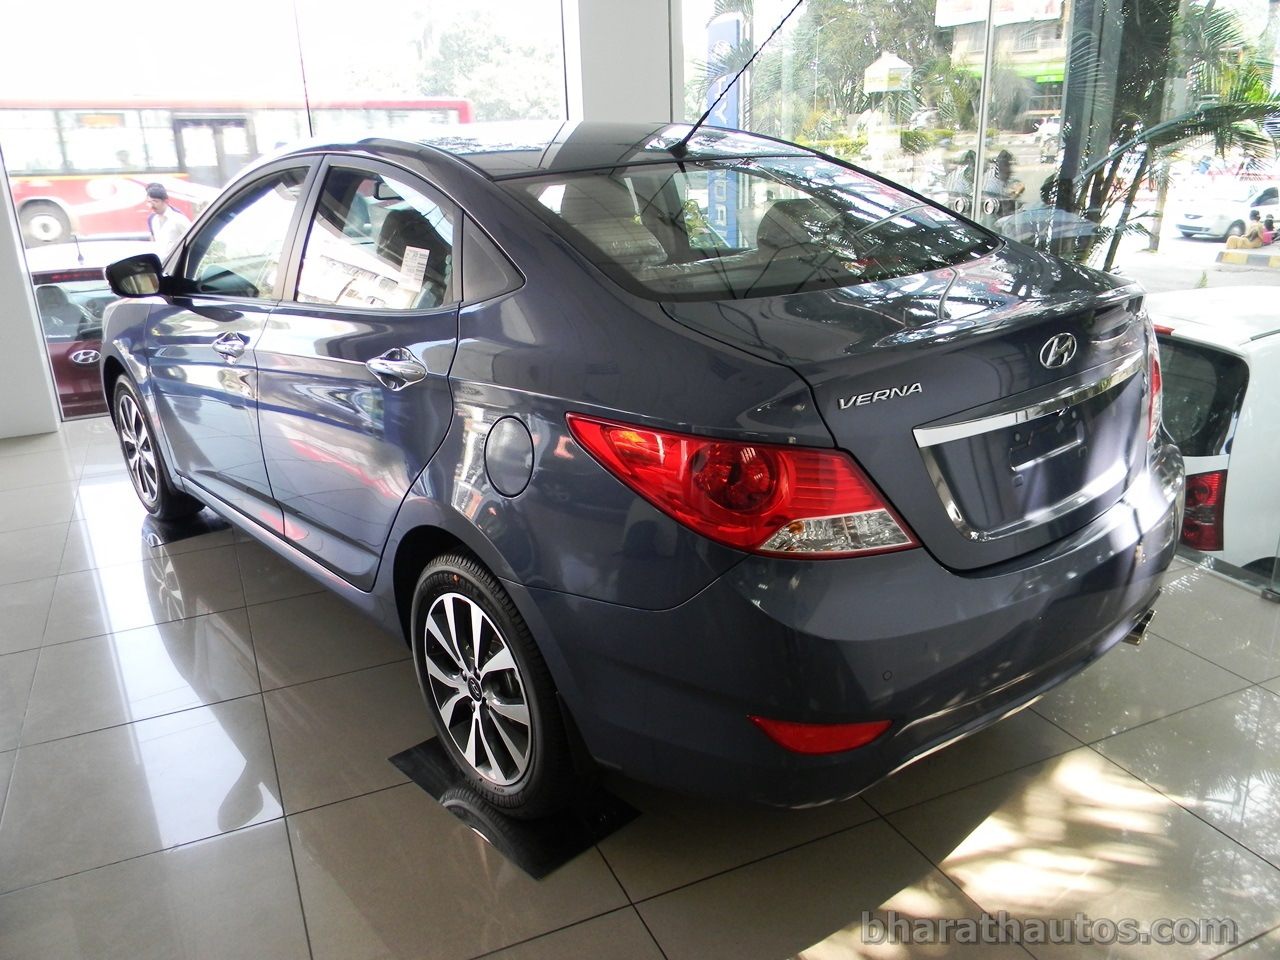 Fluidic Hyundai Verna Seen With Projector Headlamps And